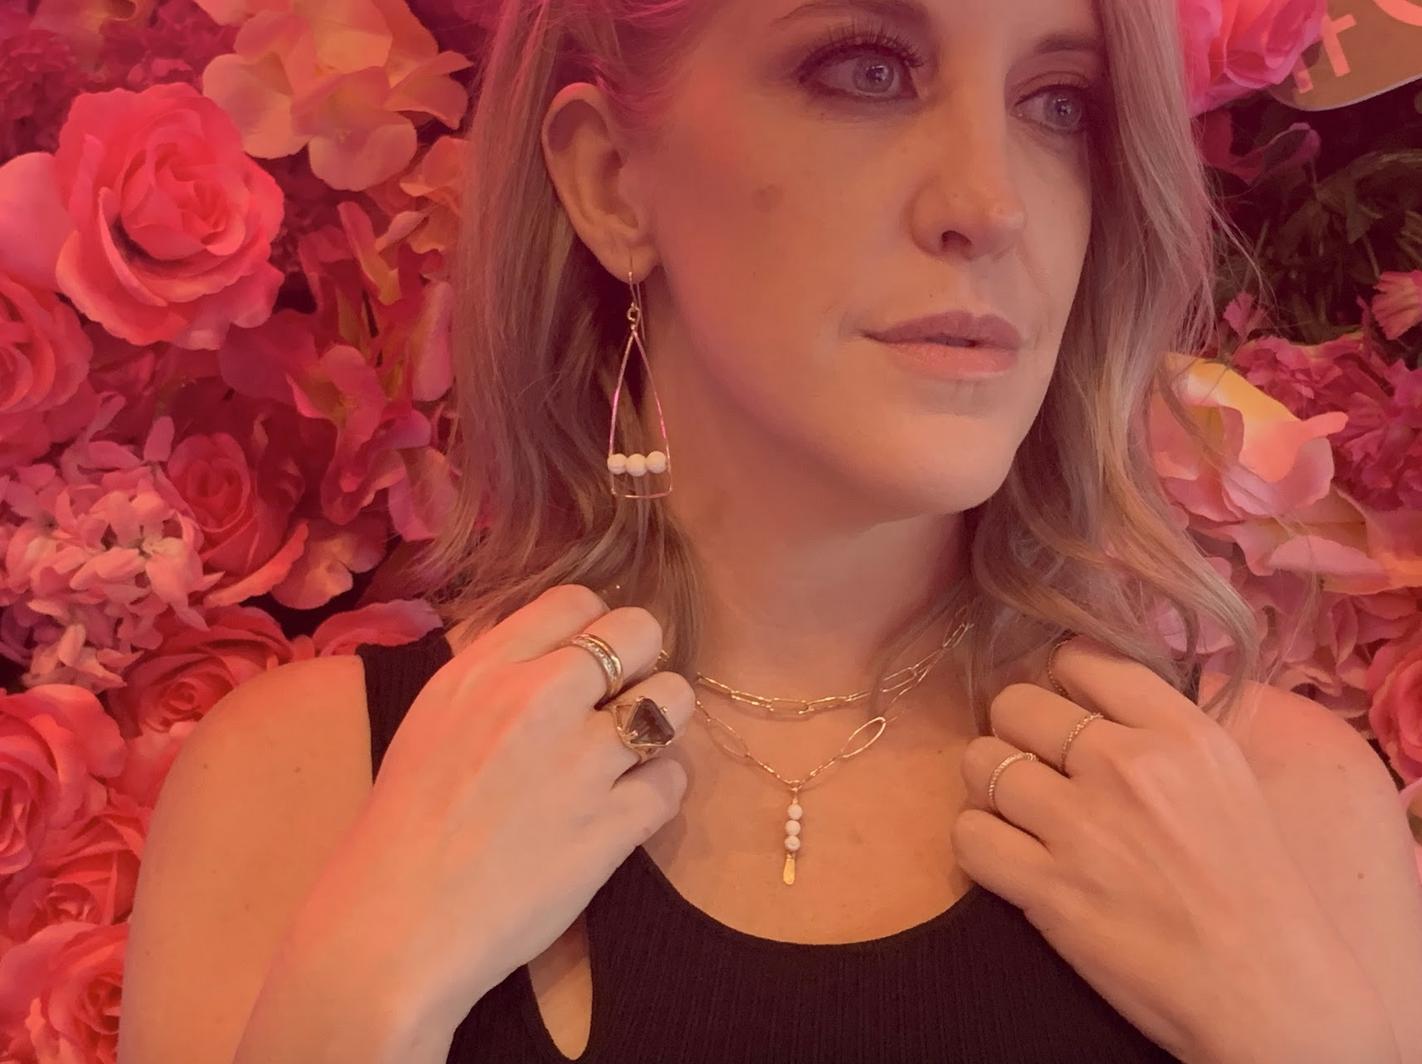 Ashlee Dozier wearing Anuket x James & Jezebelle's fragrance diffusing demi-fine jewelry piece Nile earrings